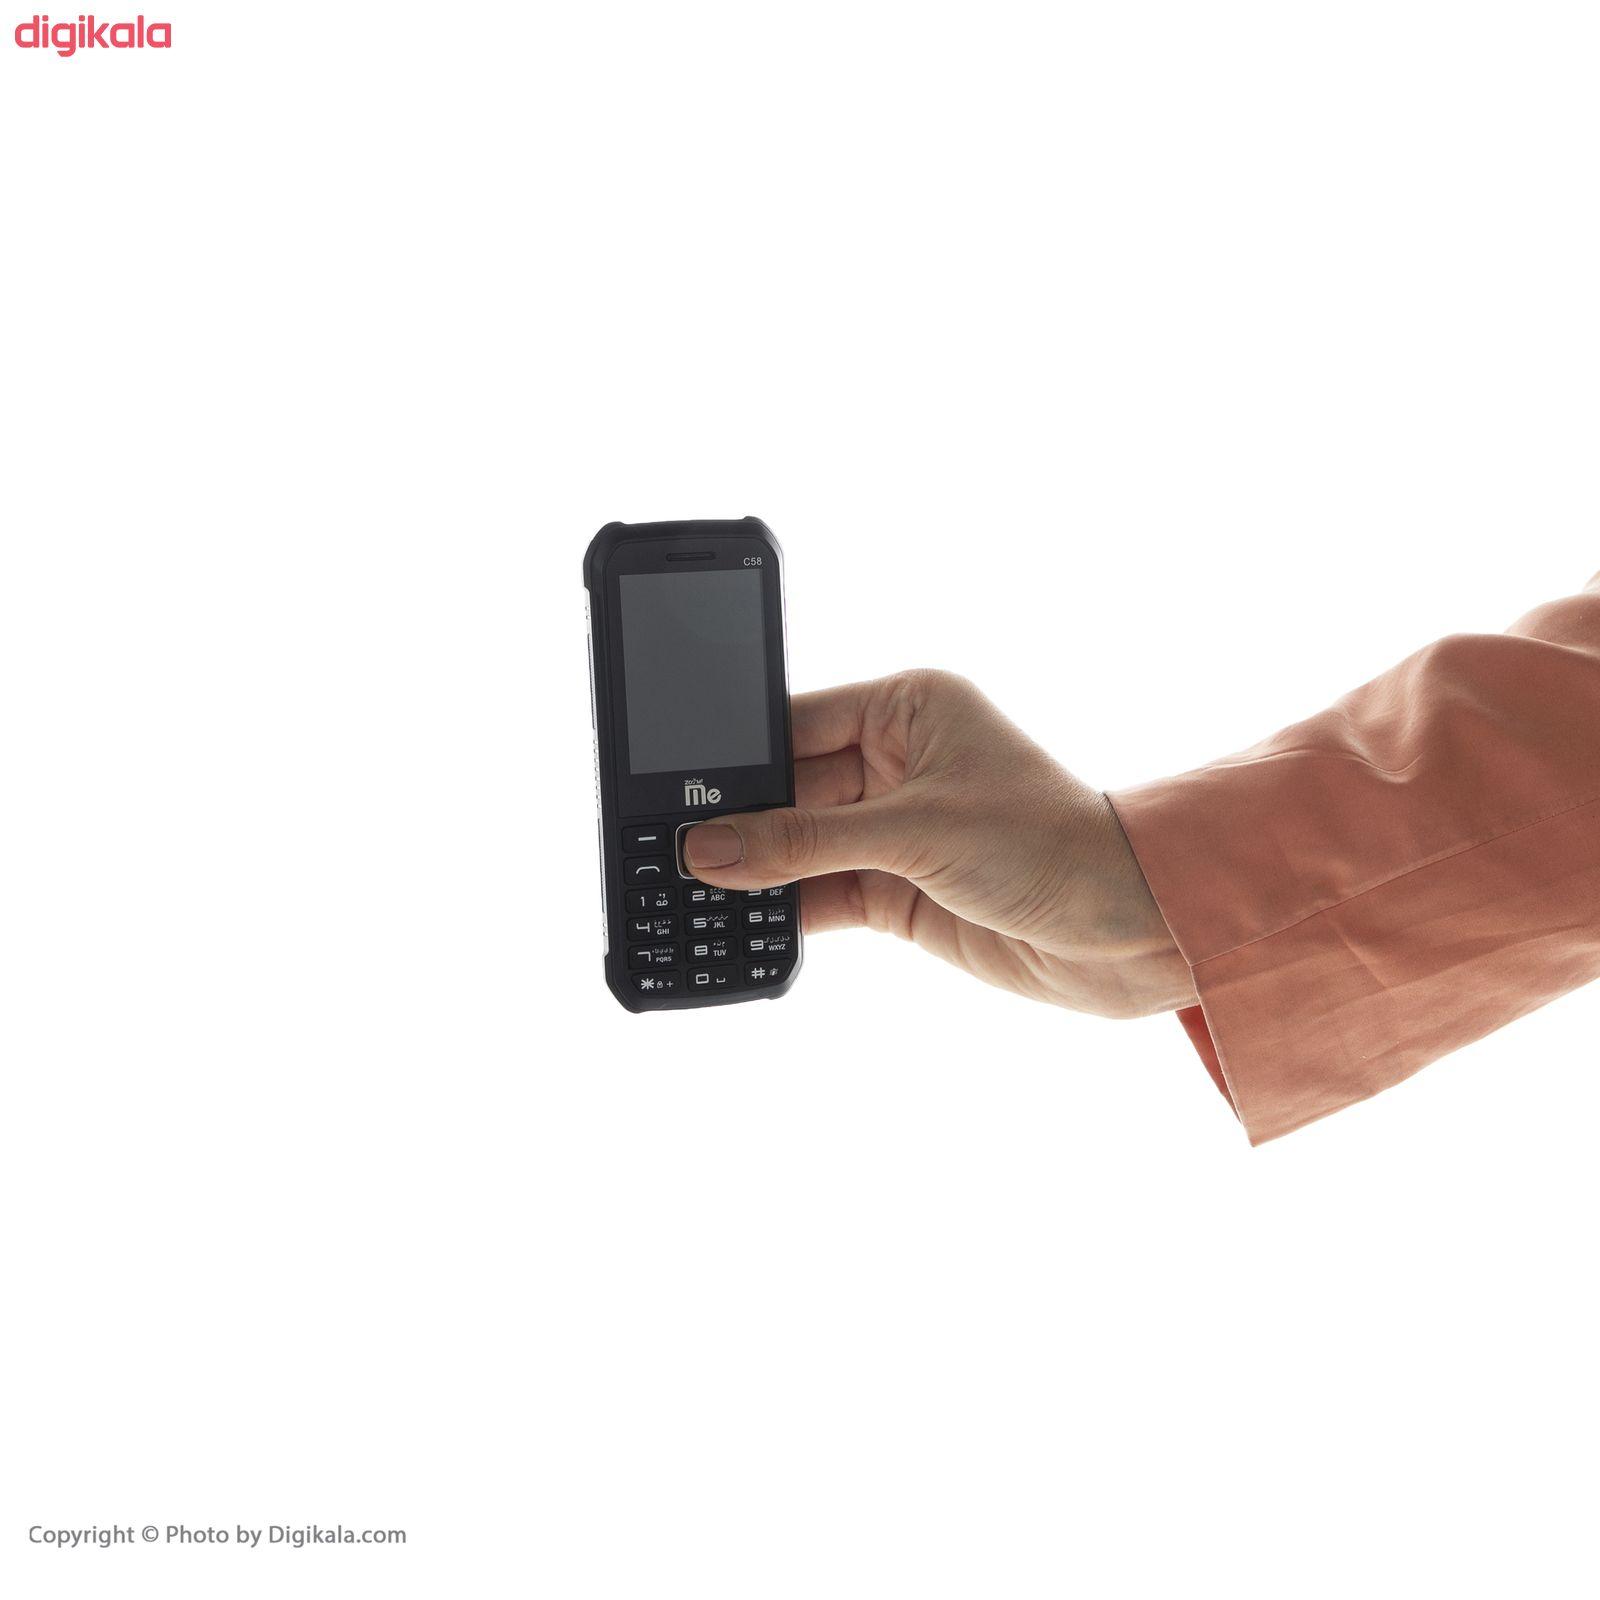 گوشی موبایل جی ال ایکس مدل Zoom me C58 دو سیم کارت main 1 21